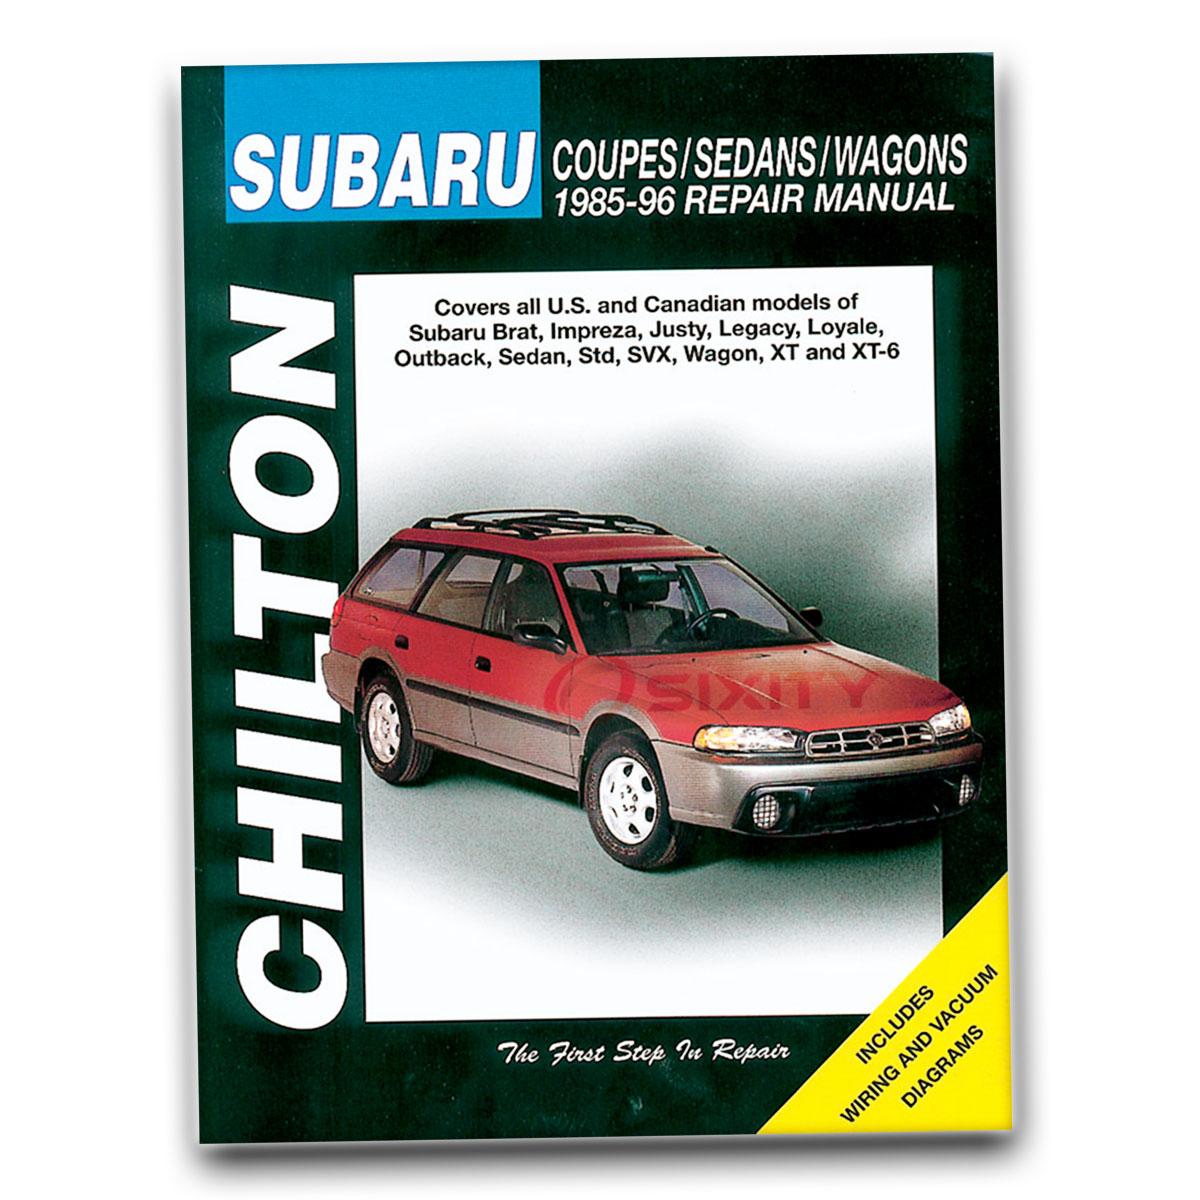 Chilton Repair Manual For 1987 1994 Subaru Justy Shop Service Garage Book By Ebay